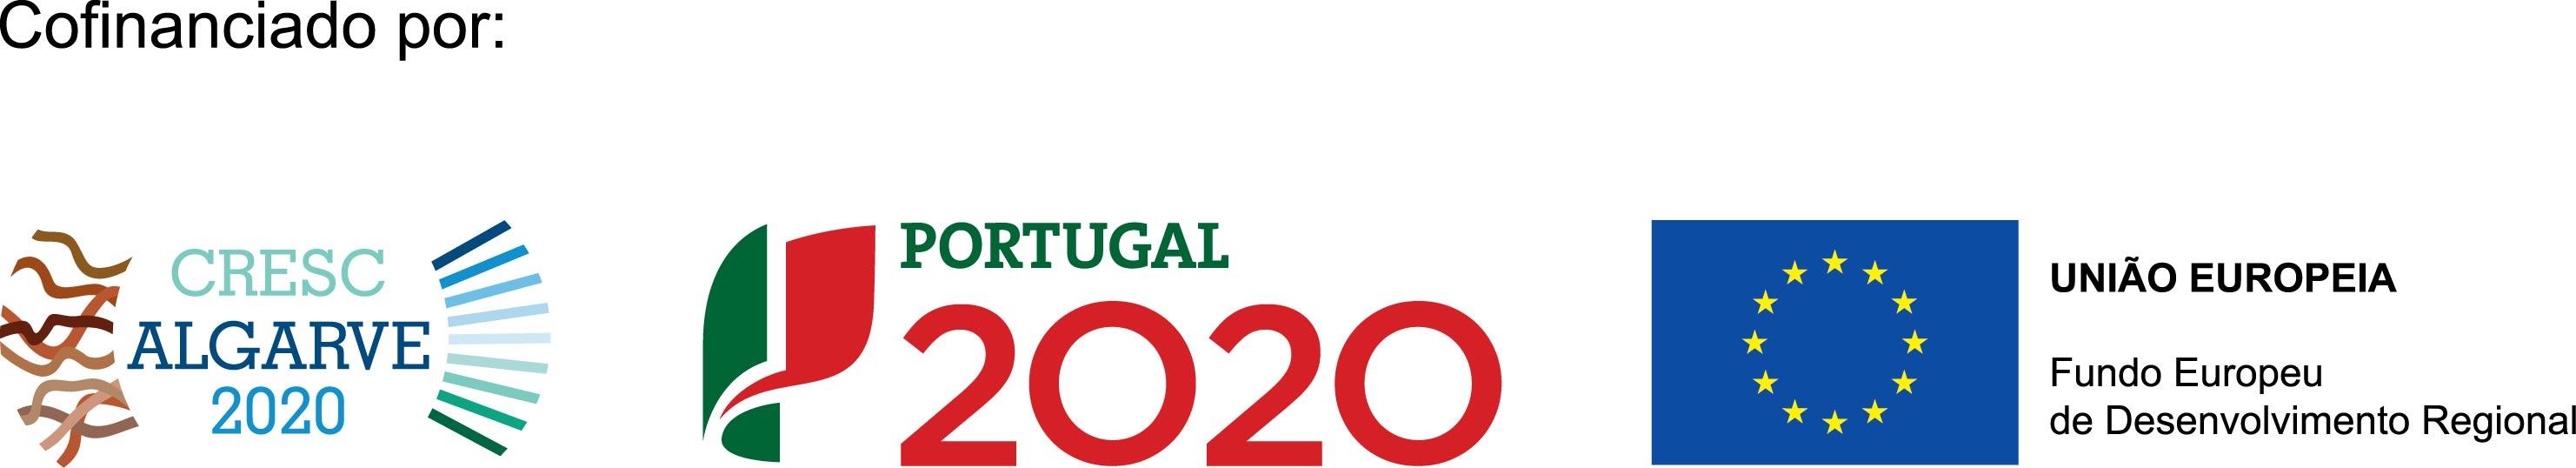 POAlgarve PT2020 FEDER Bom